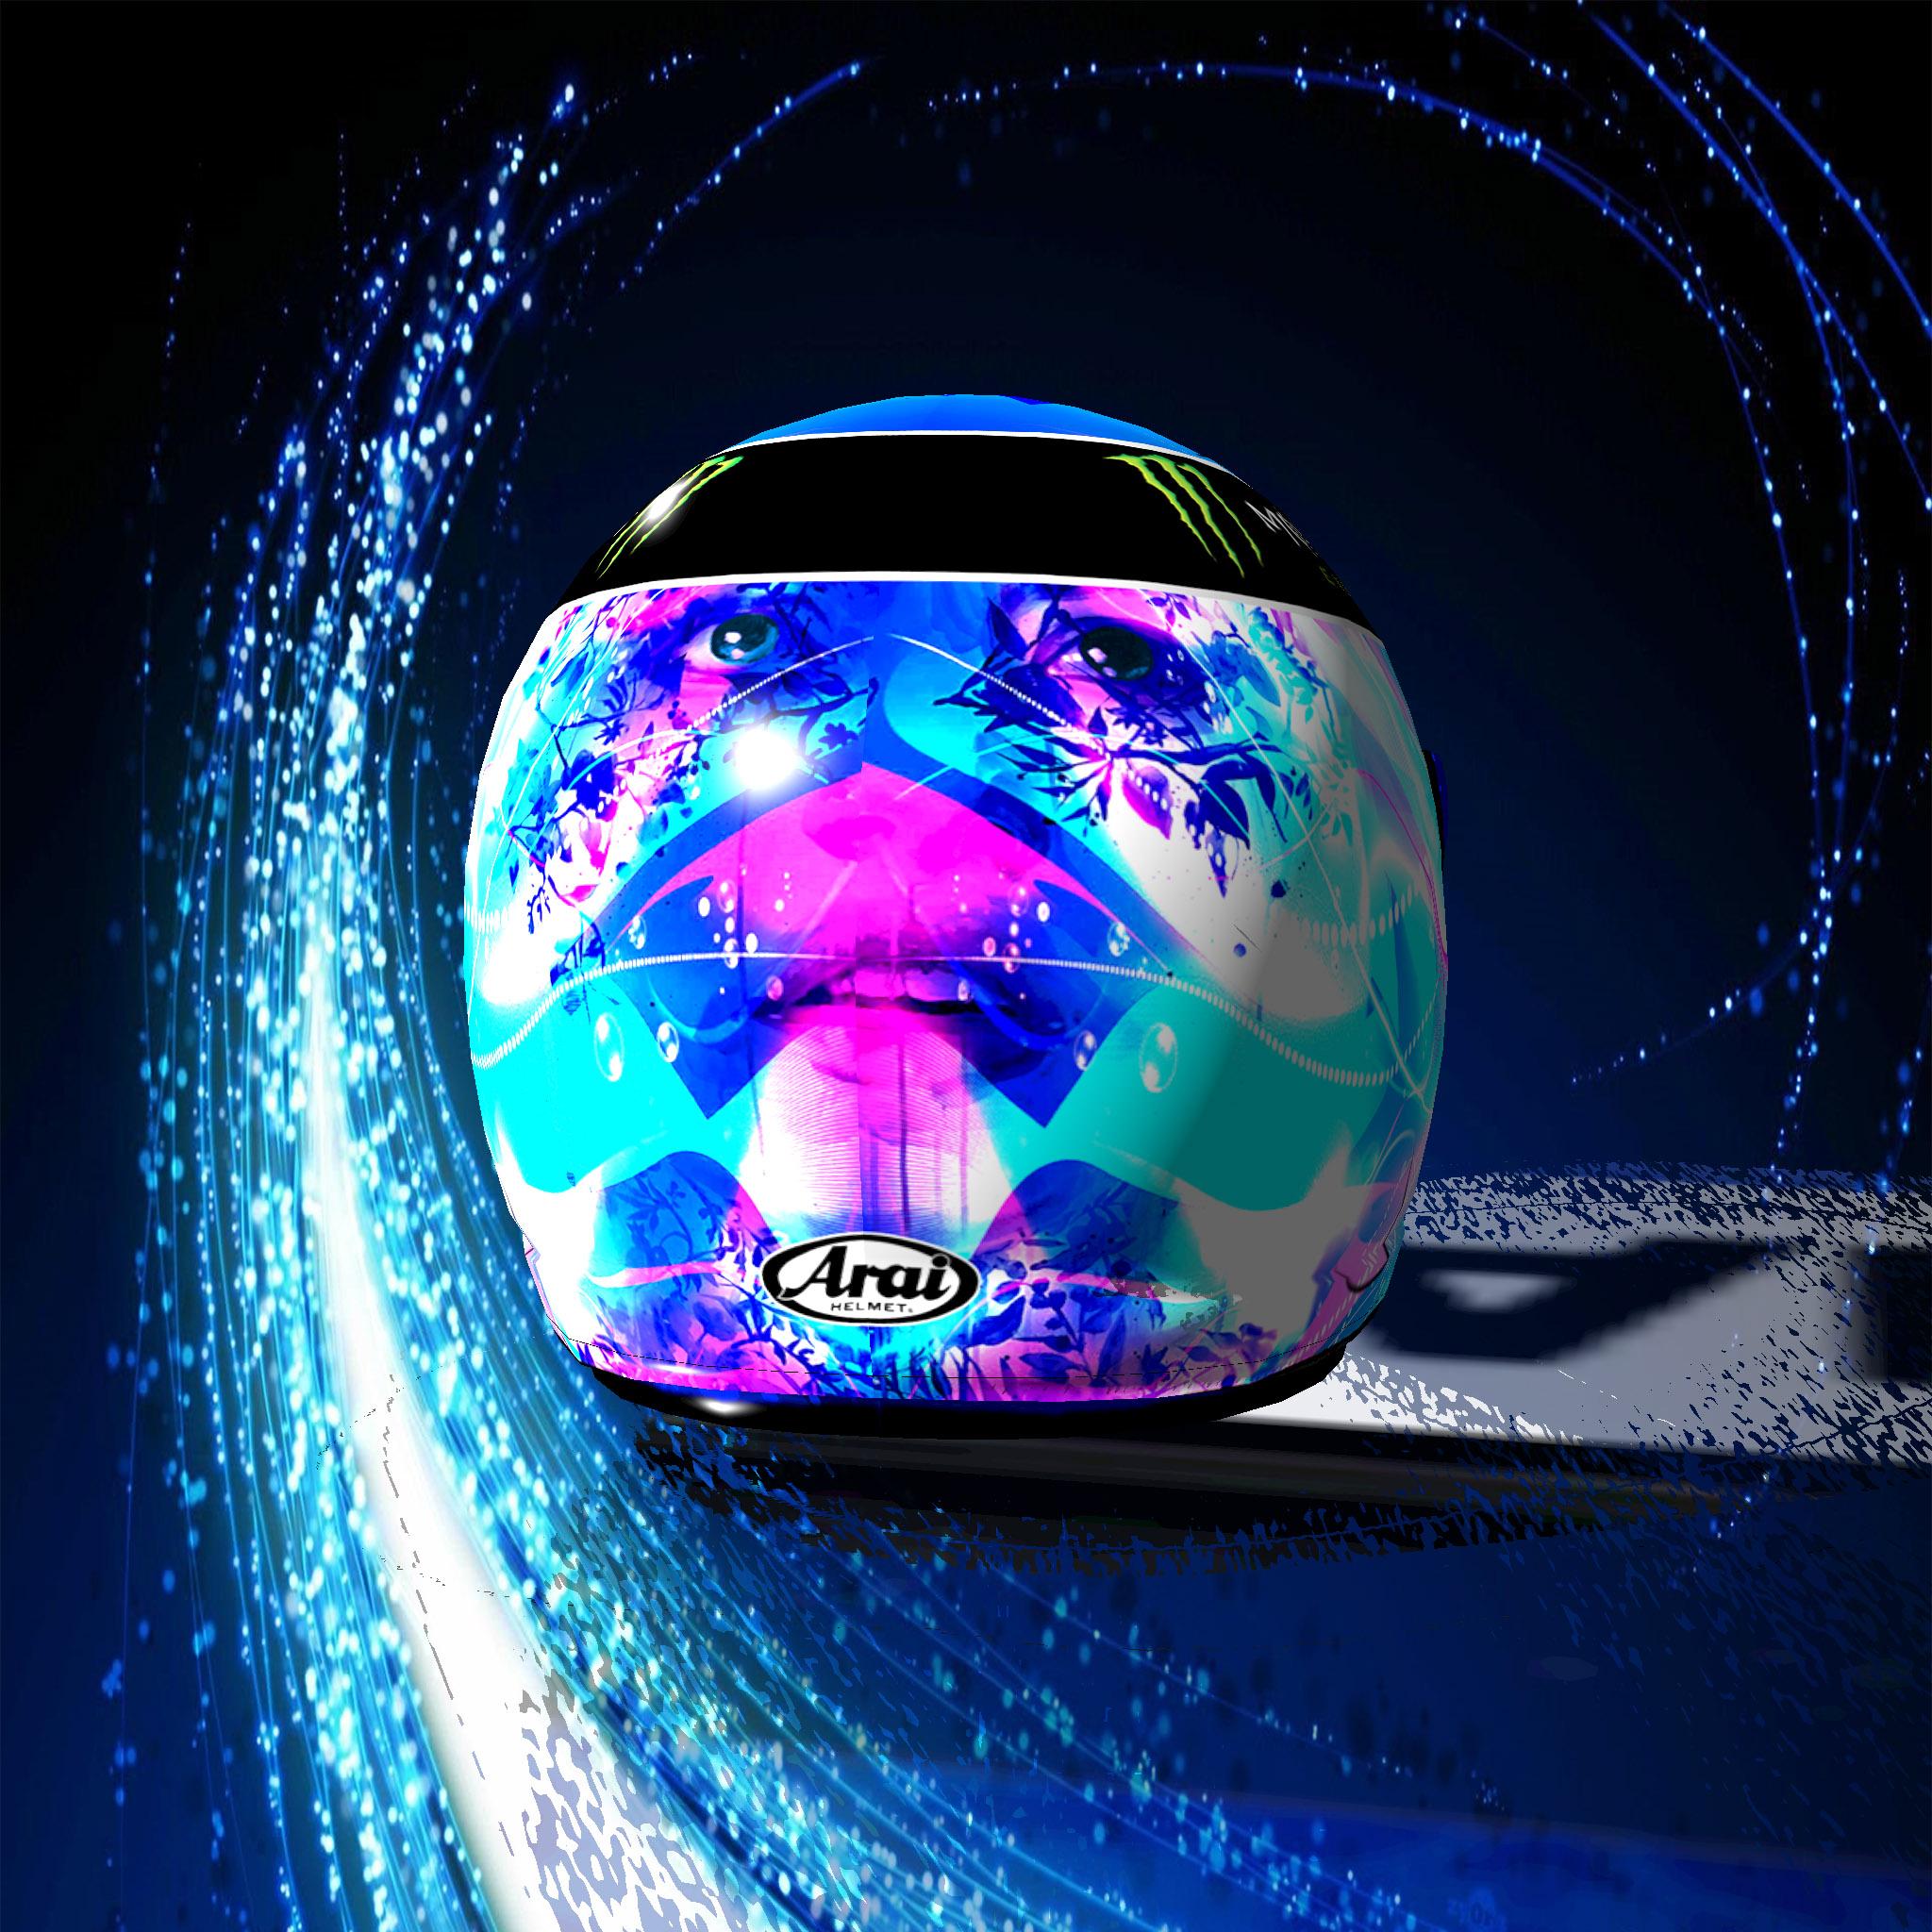 3D Helmet Sm2.jpg